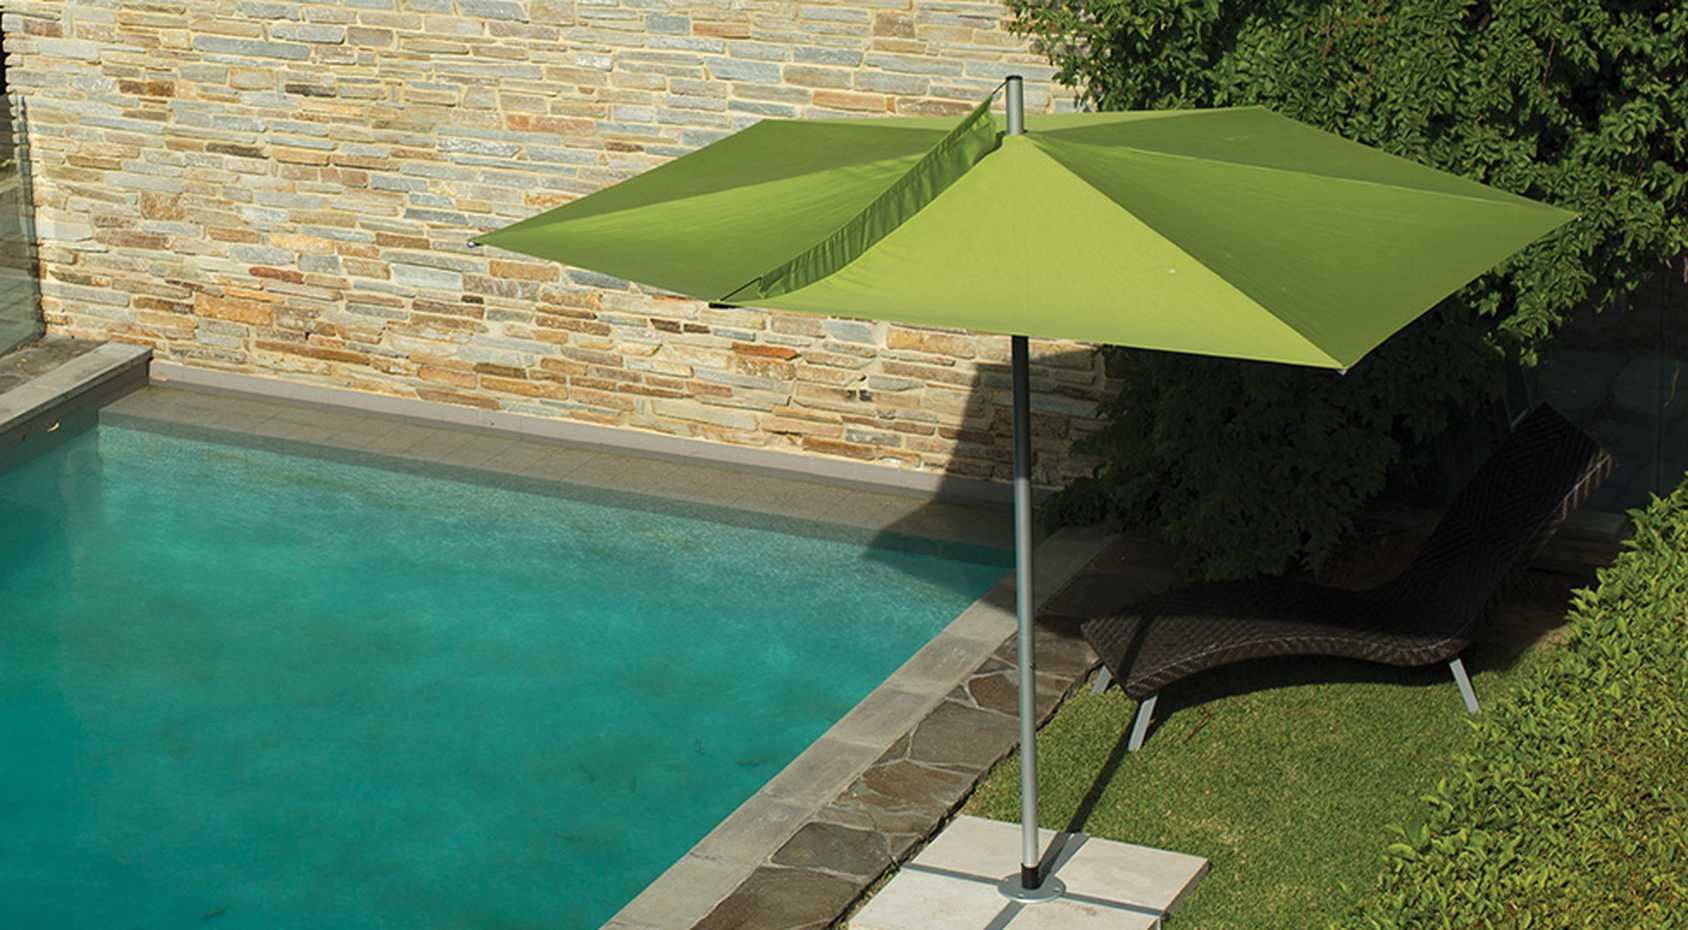 Finbrella by Finbrella product image 3